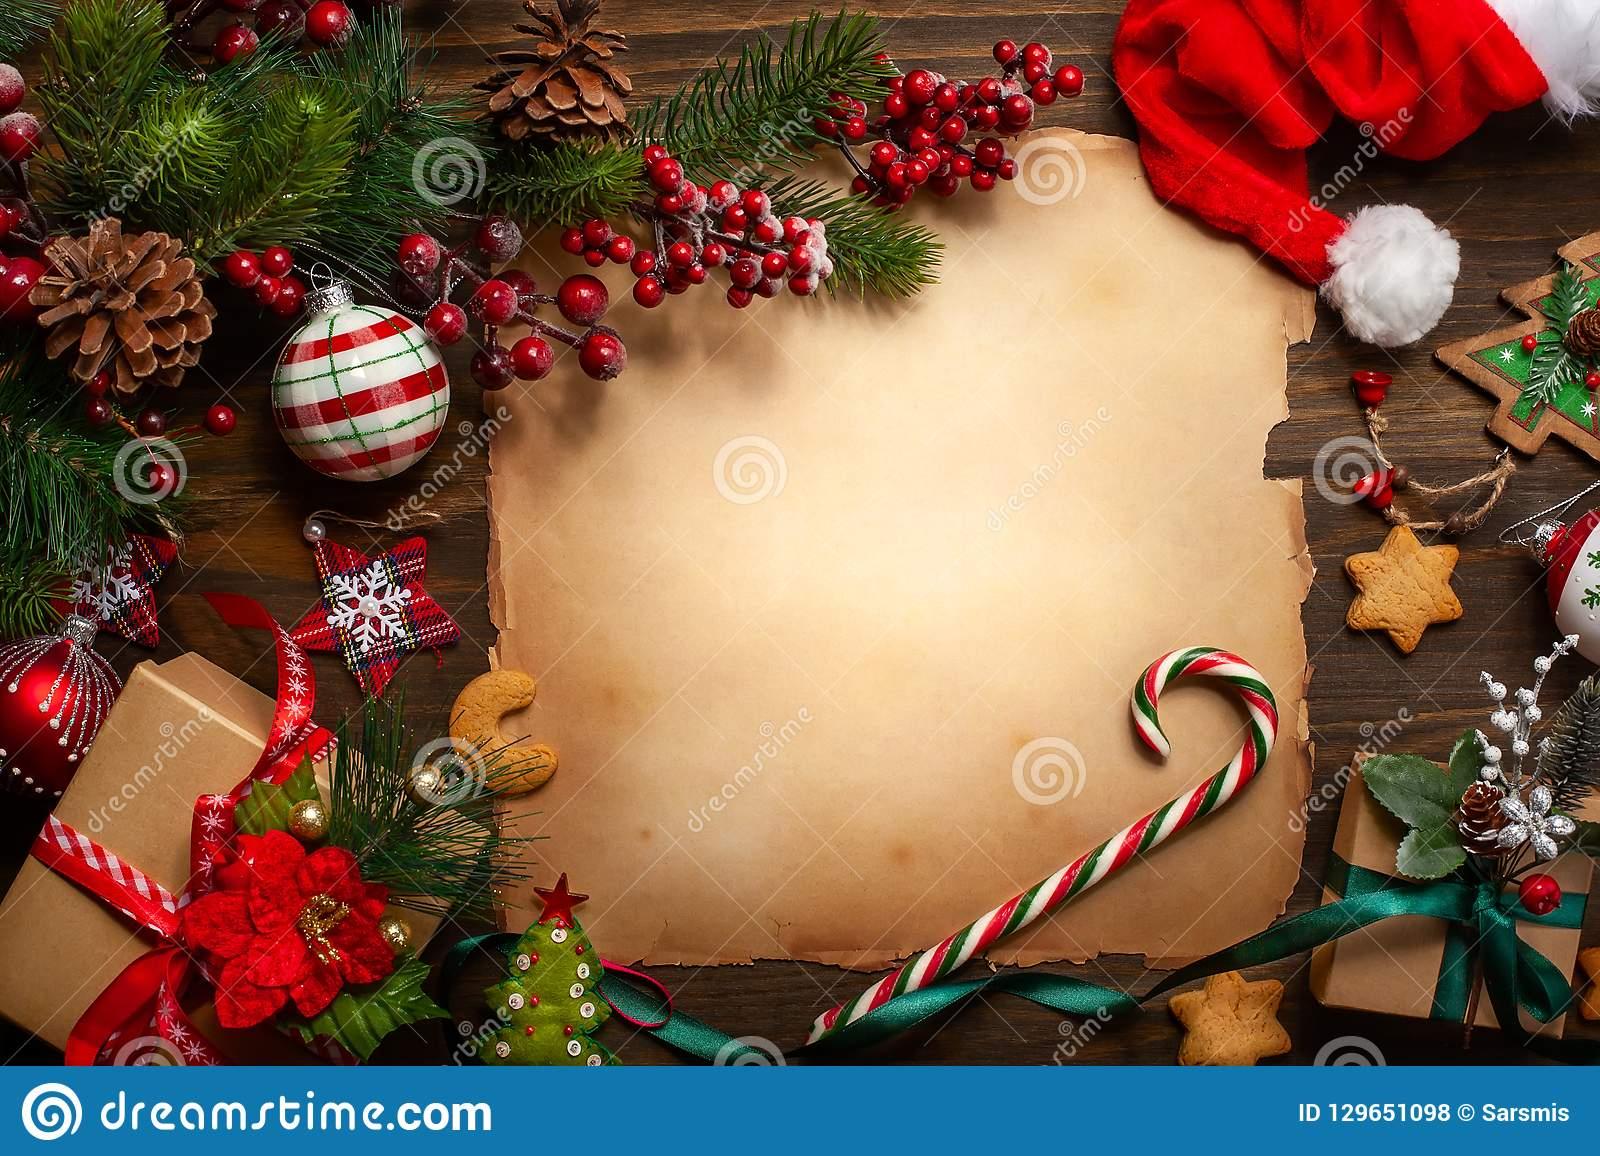 Christmas Greeting Card With Vintage Paper For Letter Santa dedans Papier Lettre De Noel